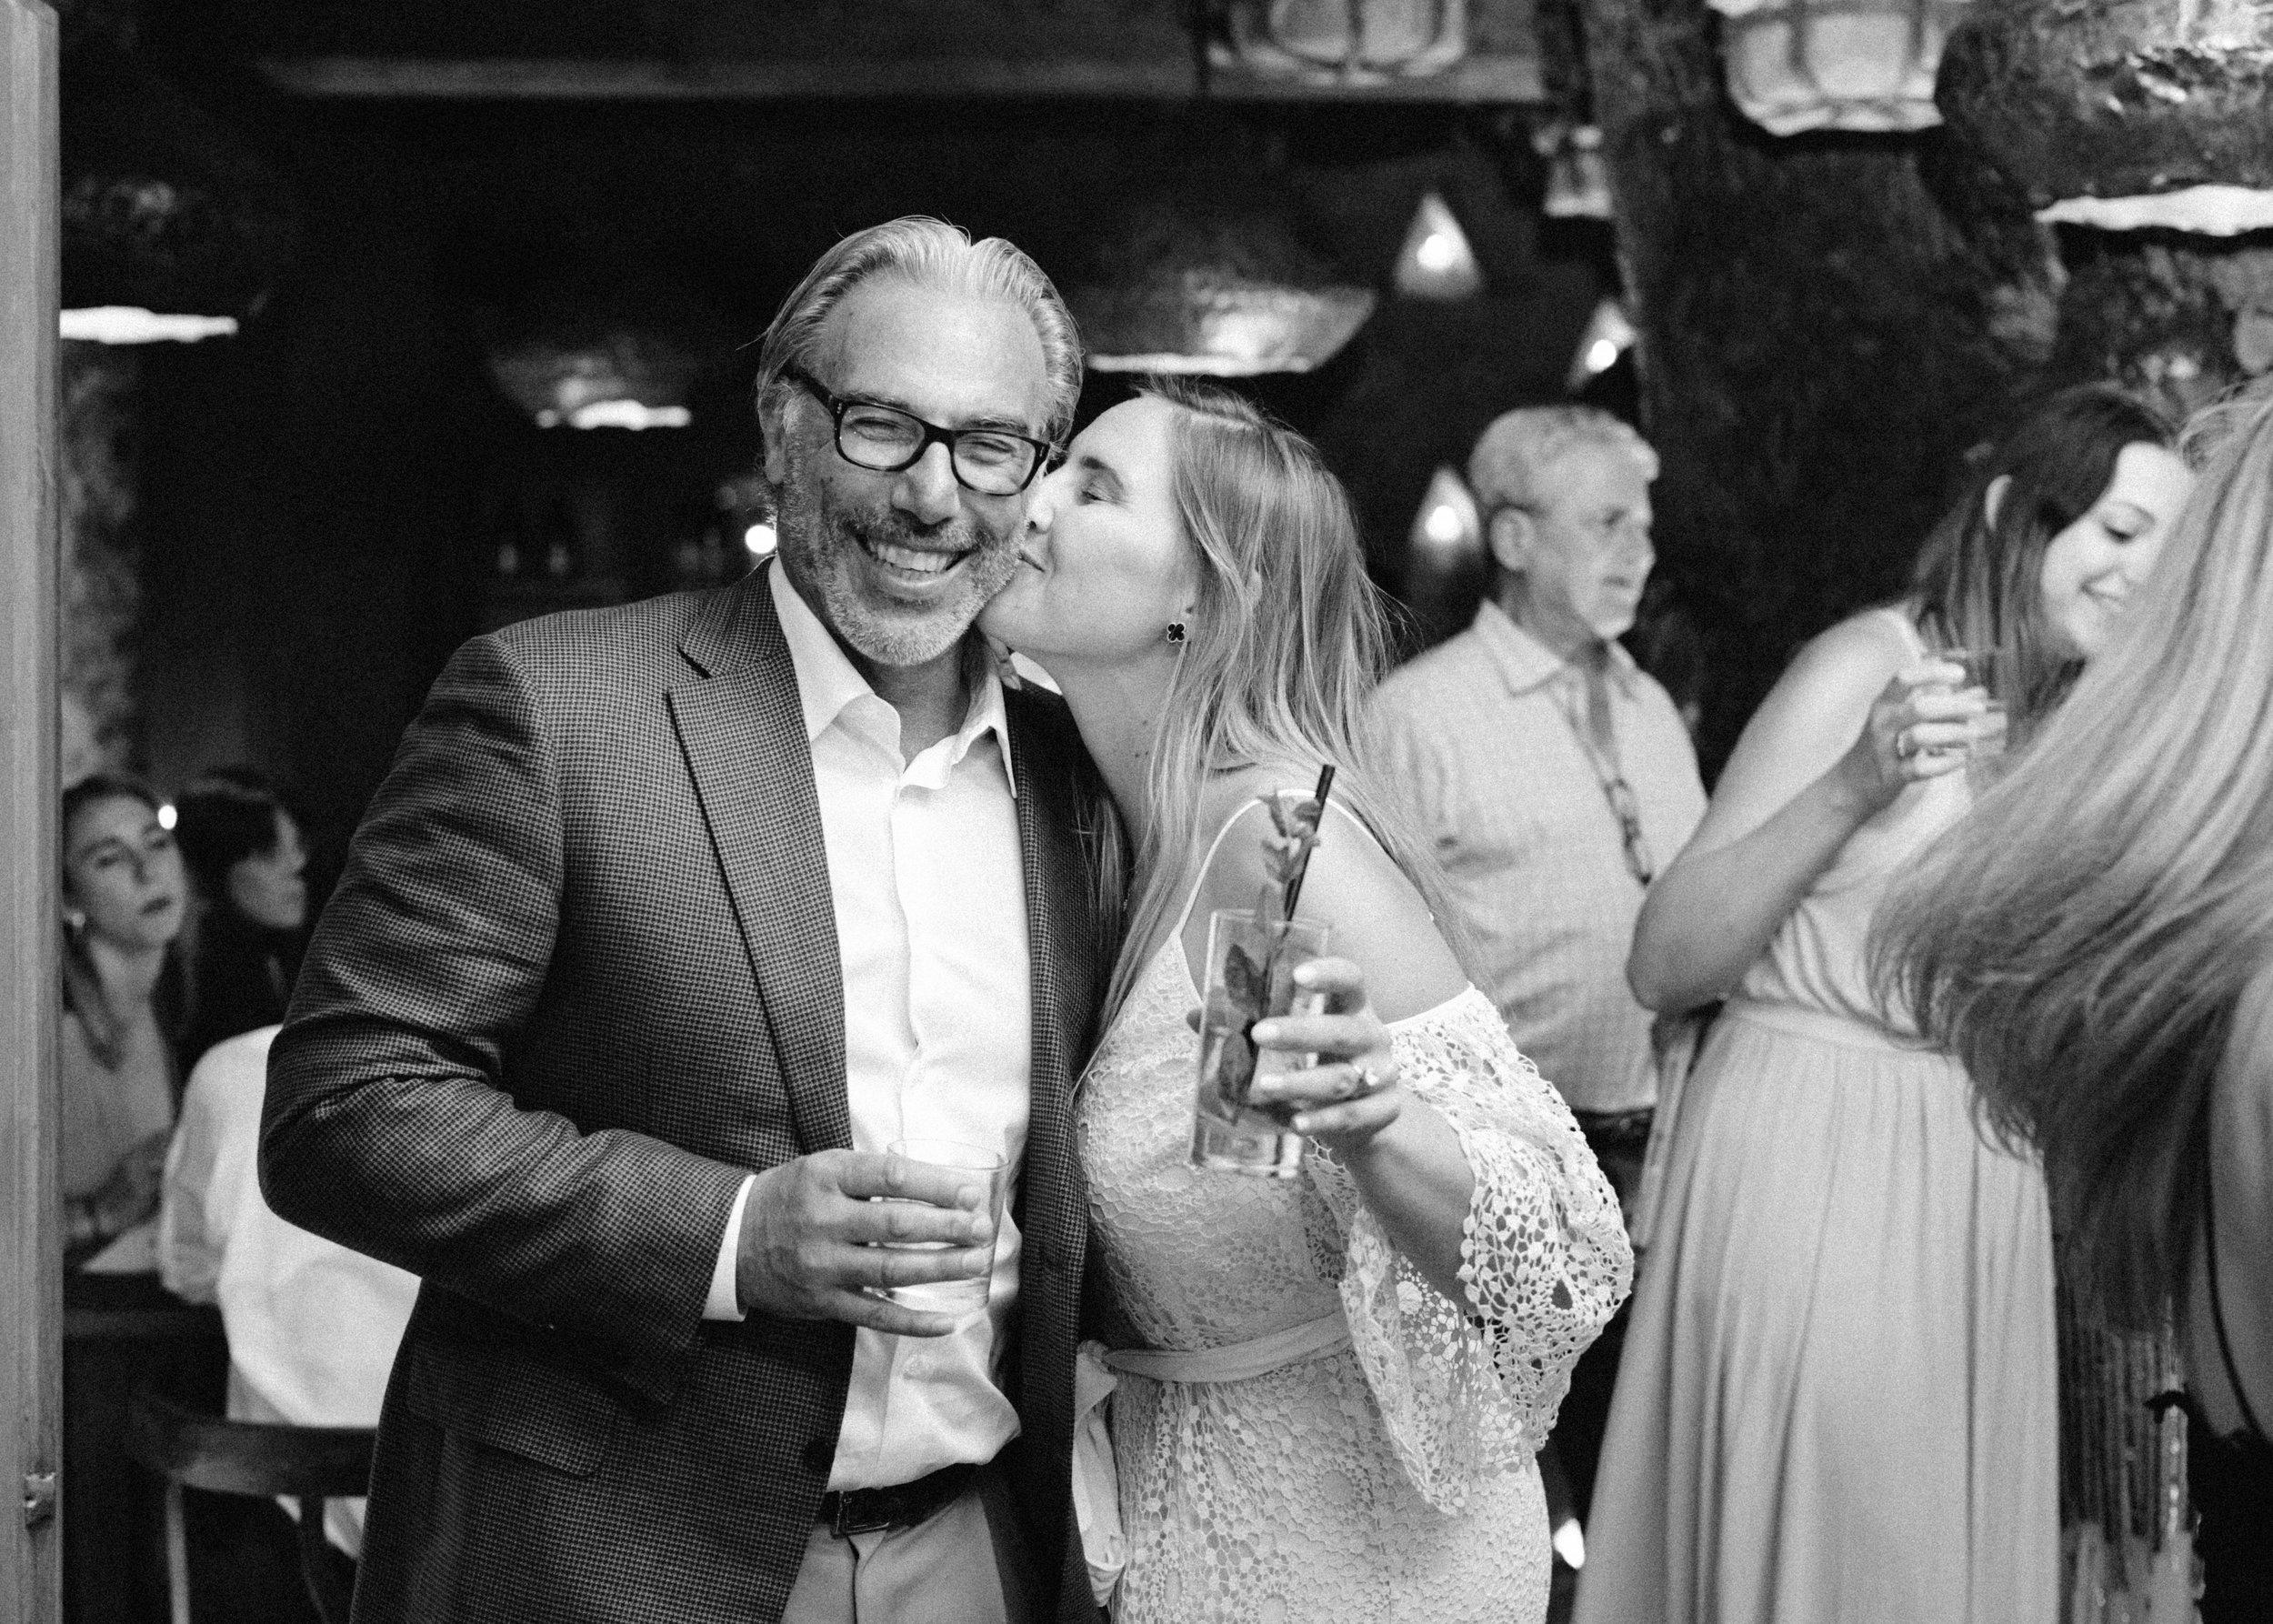 Kyle John l Fine Art Wedding Photography l Chicago, Copenhagen, California, New York, Destination l Blog l Alexis and Zach_Borgo Santo Pietro_Italy_Tuscany_22